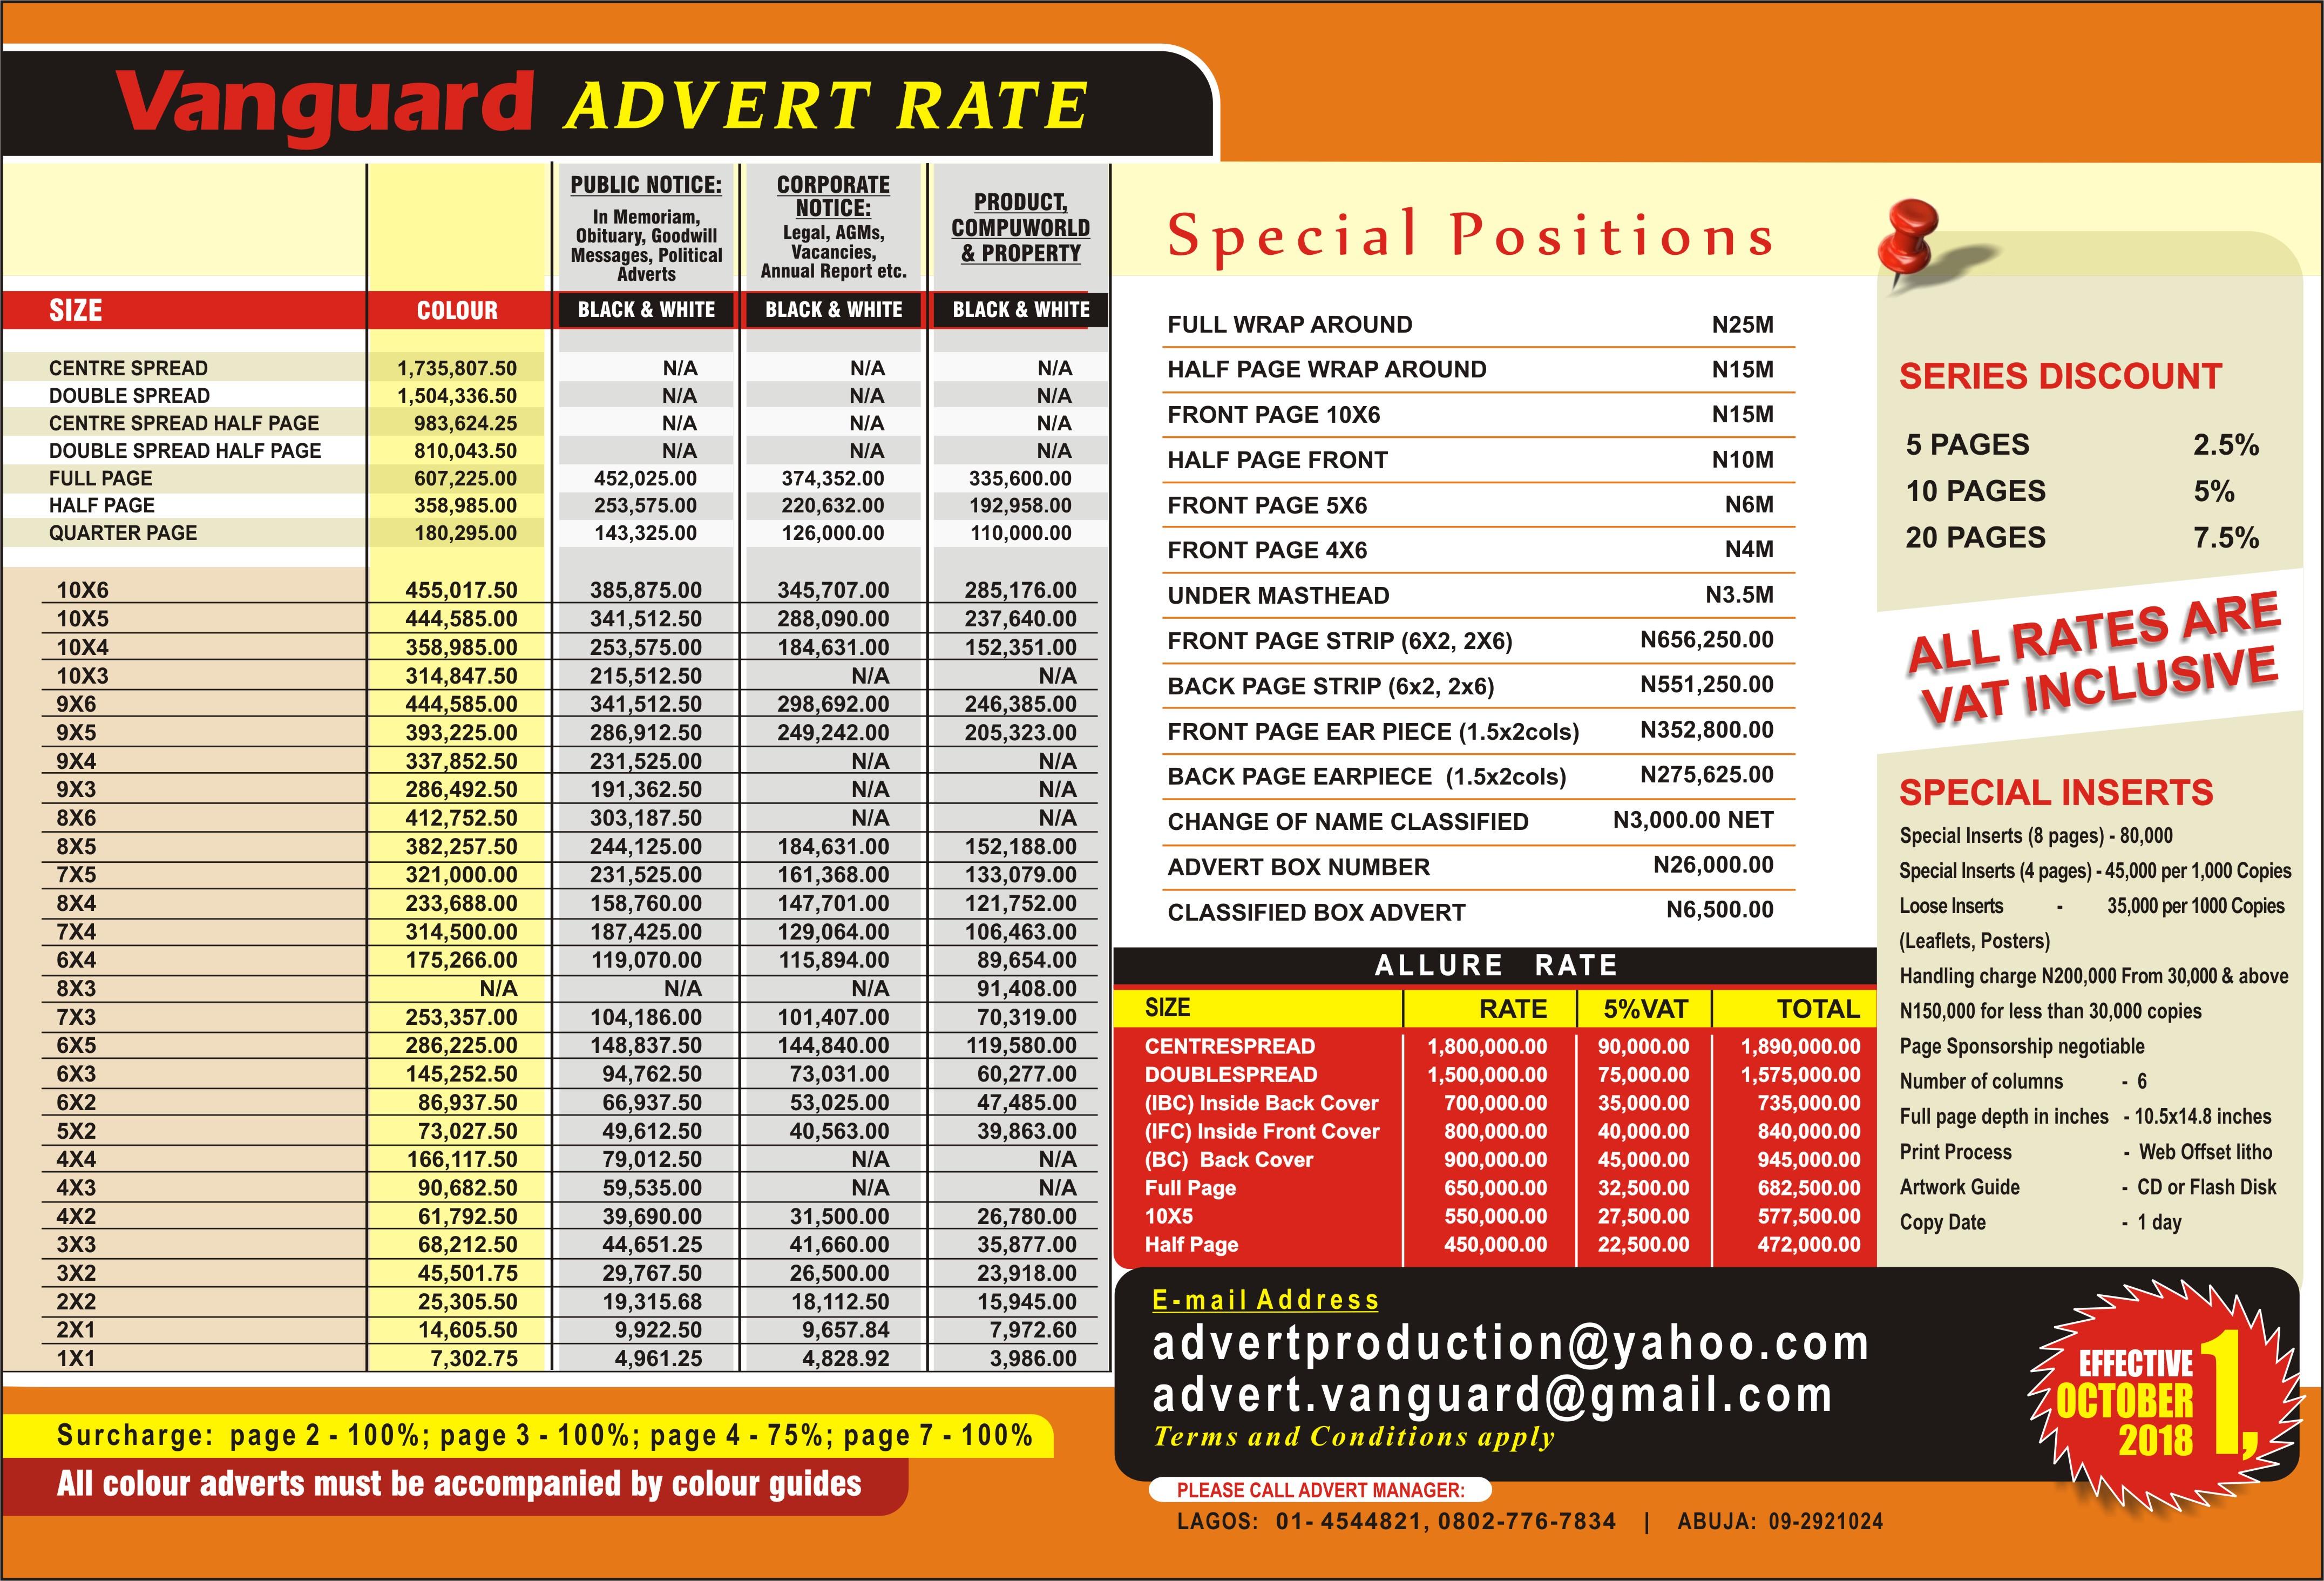 New Advert Rates (Print) Effective October 1 2018